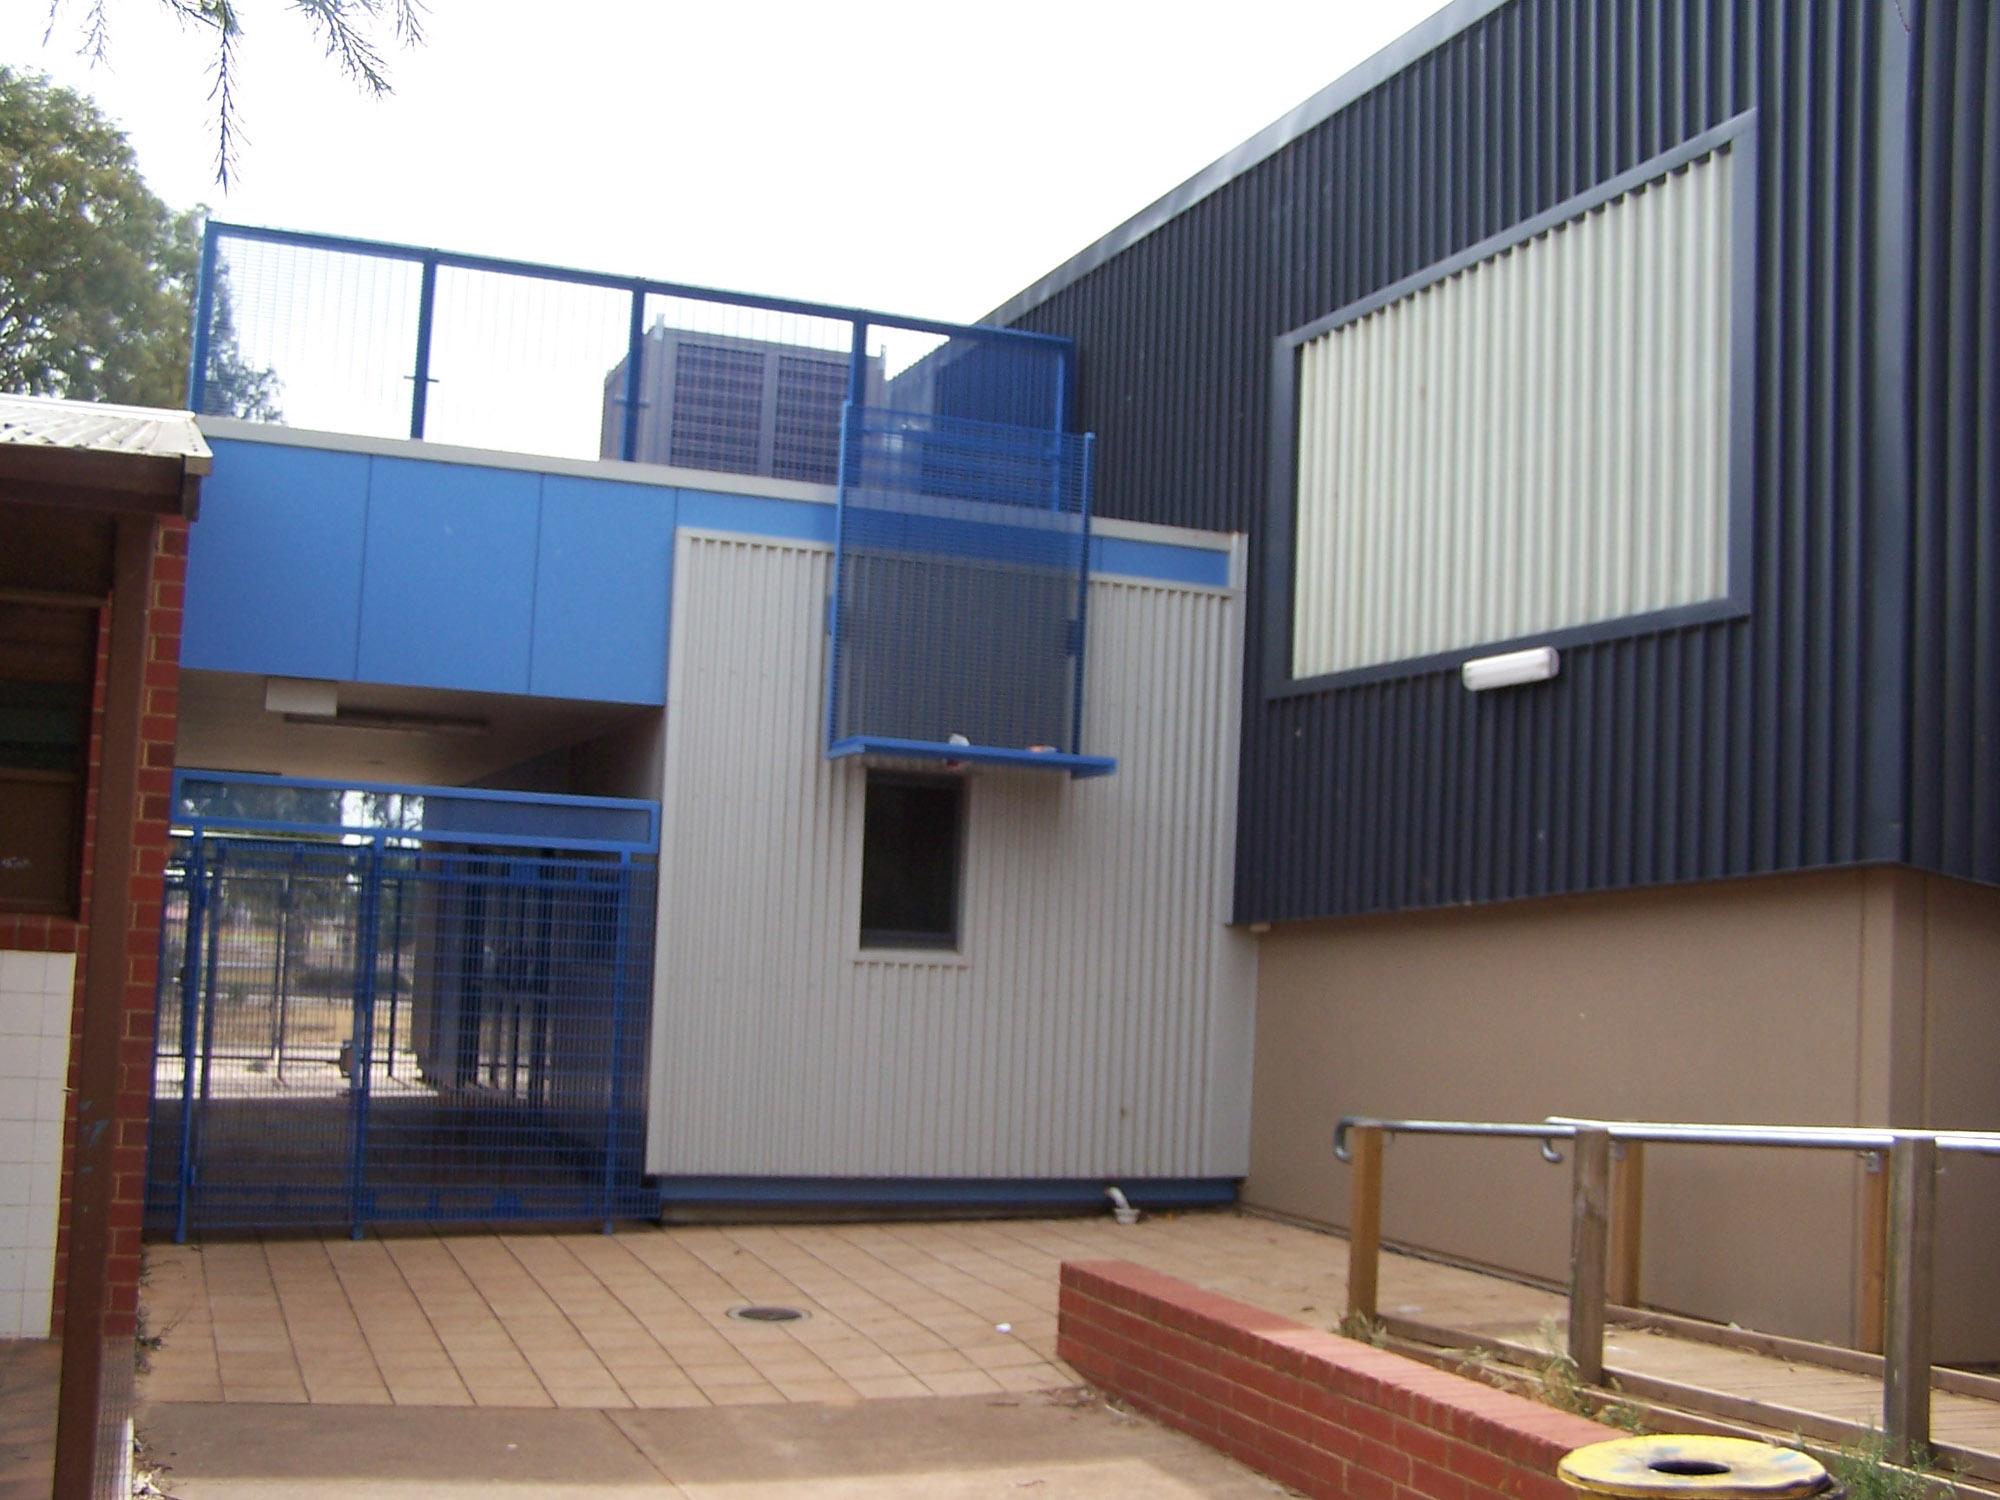 2004 - Salisbury North High School